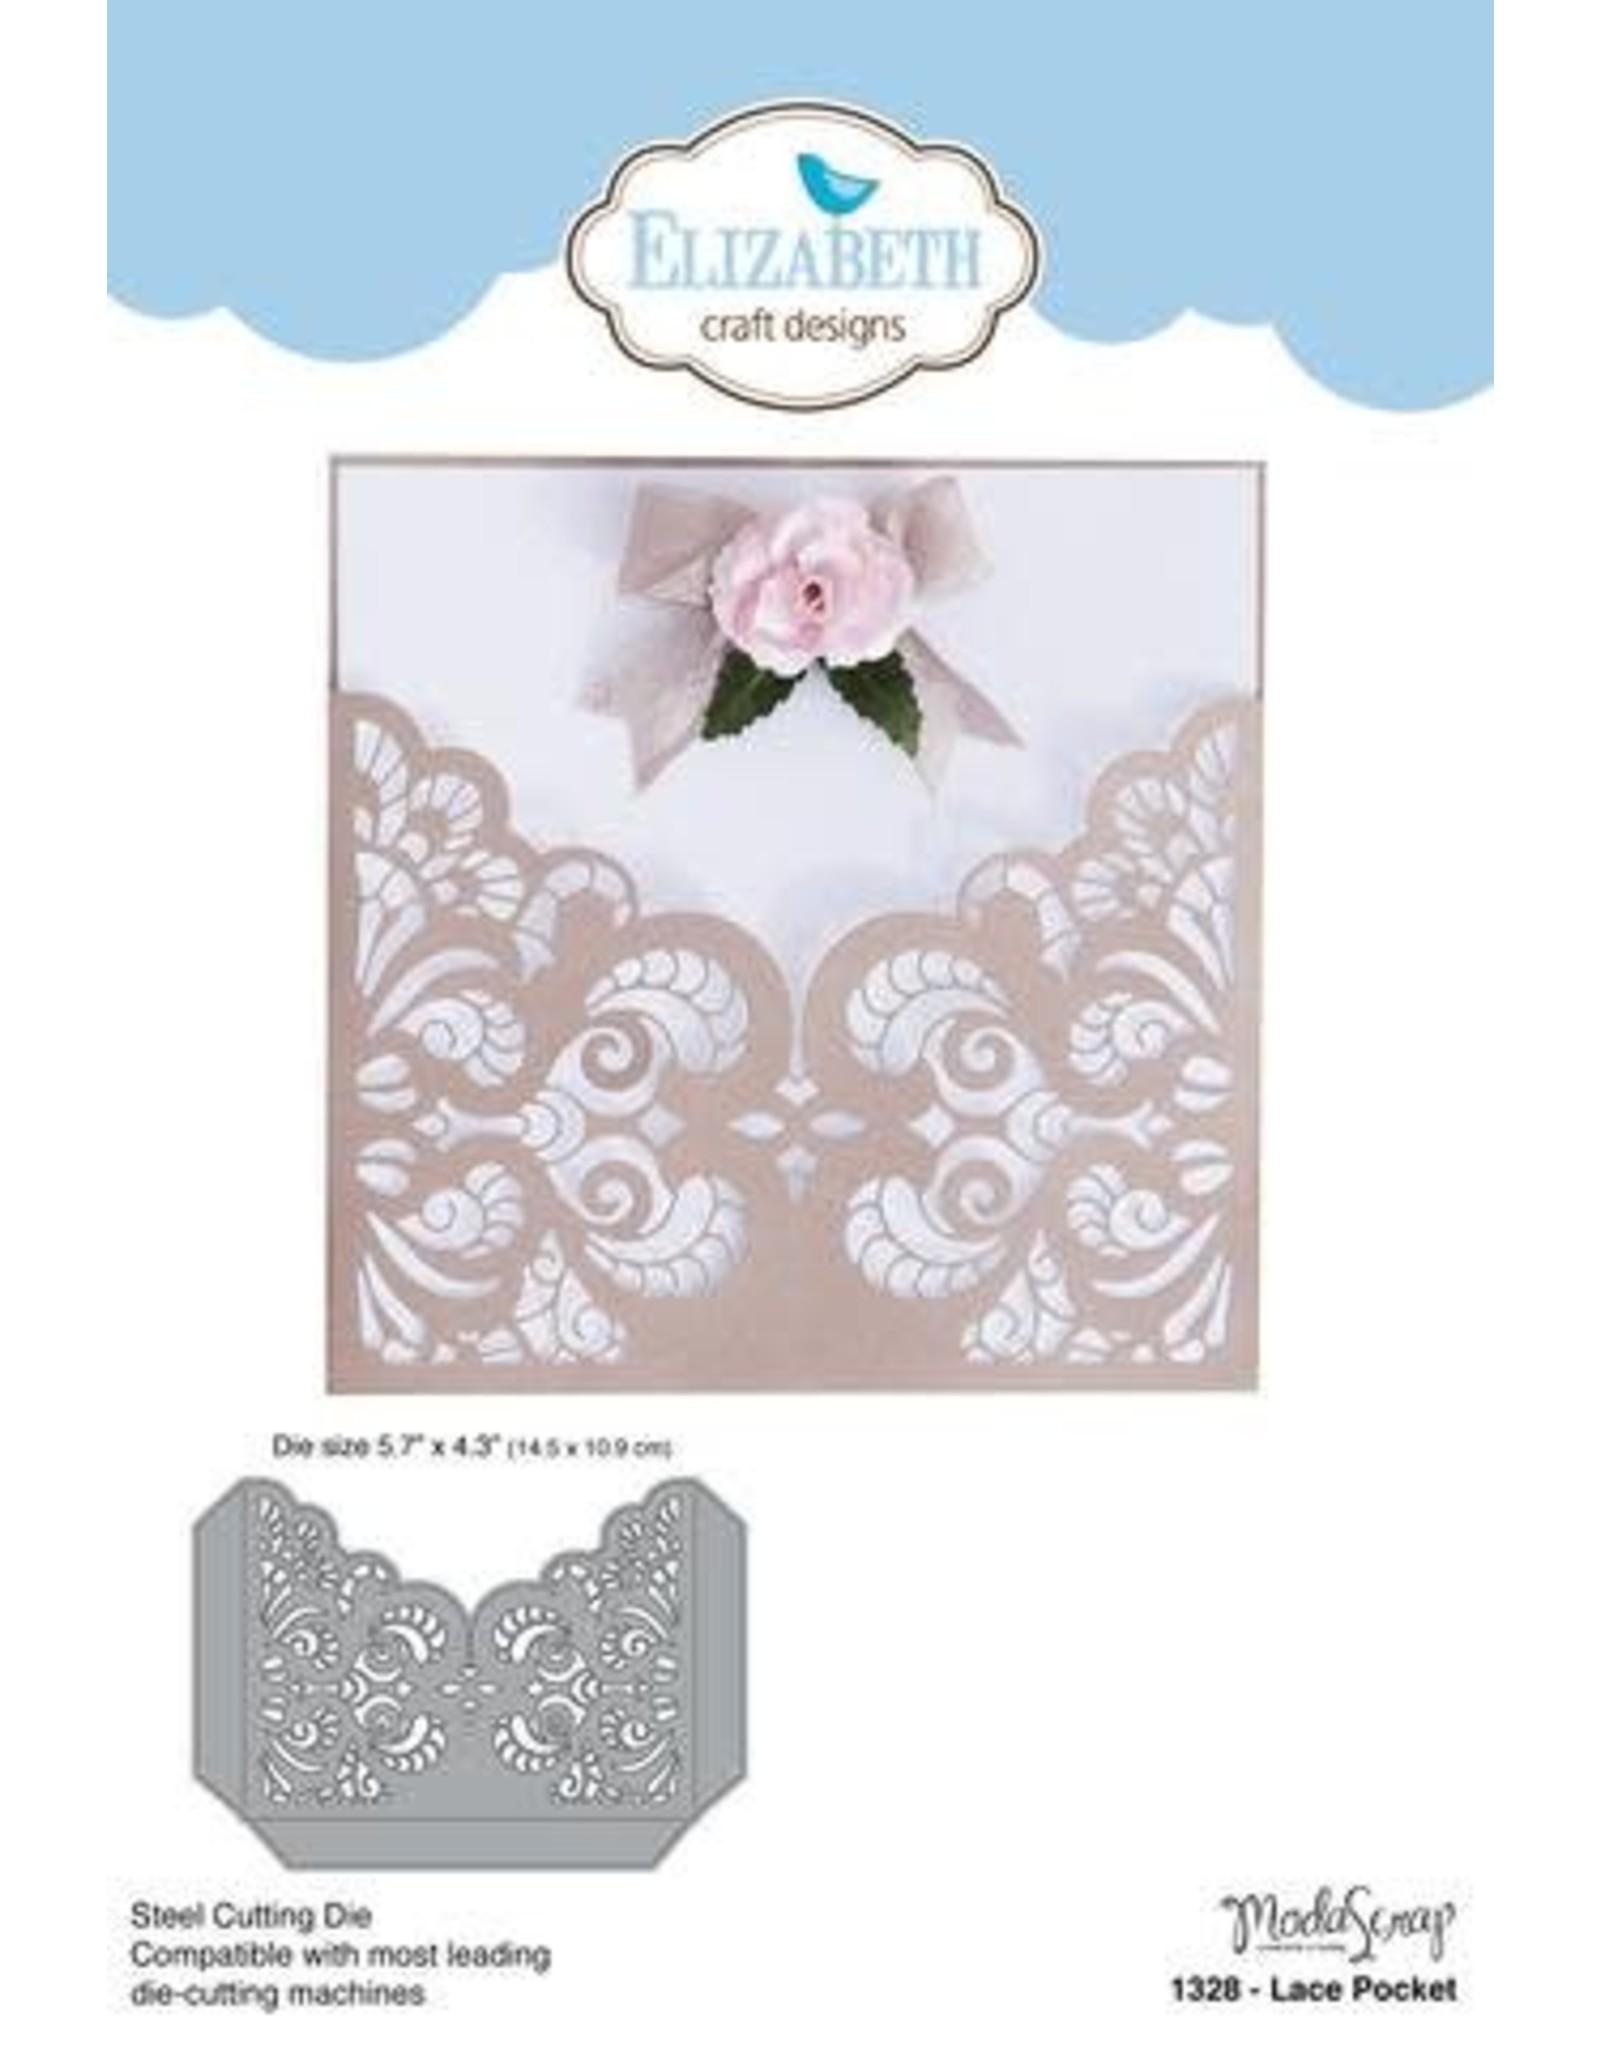 Elizabeth Craft Designs Elizabeth Craft Designs dies Lace Pocket 1328